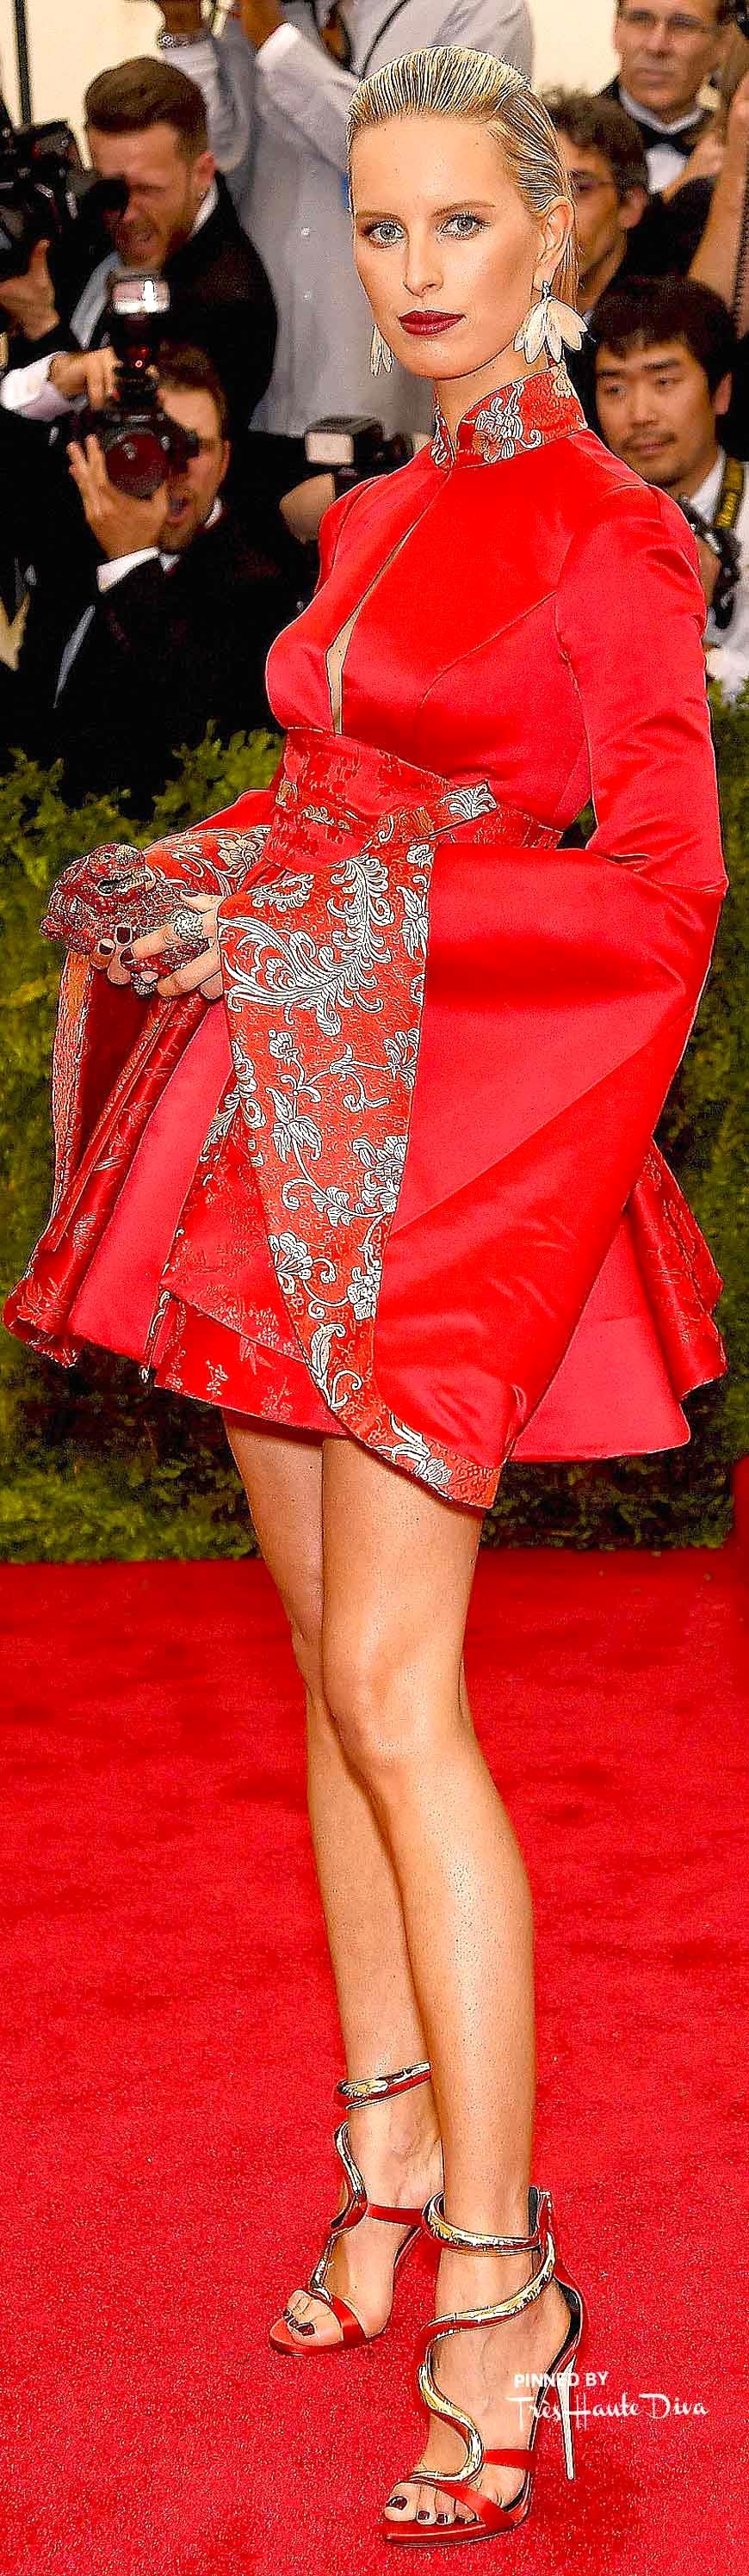 Karolina Kurkova in Tommy Hilfiger & Fred Leighton Jewelry Getty Images/ Dimitrios Kambouris